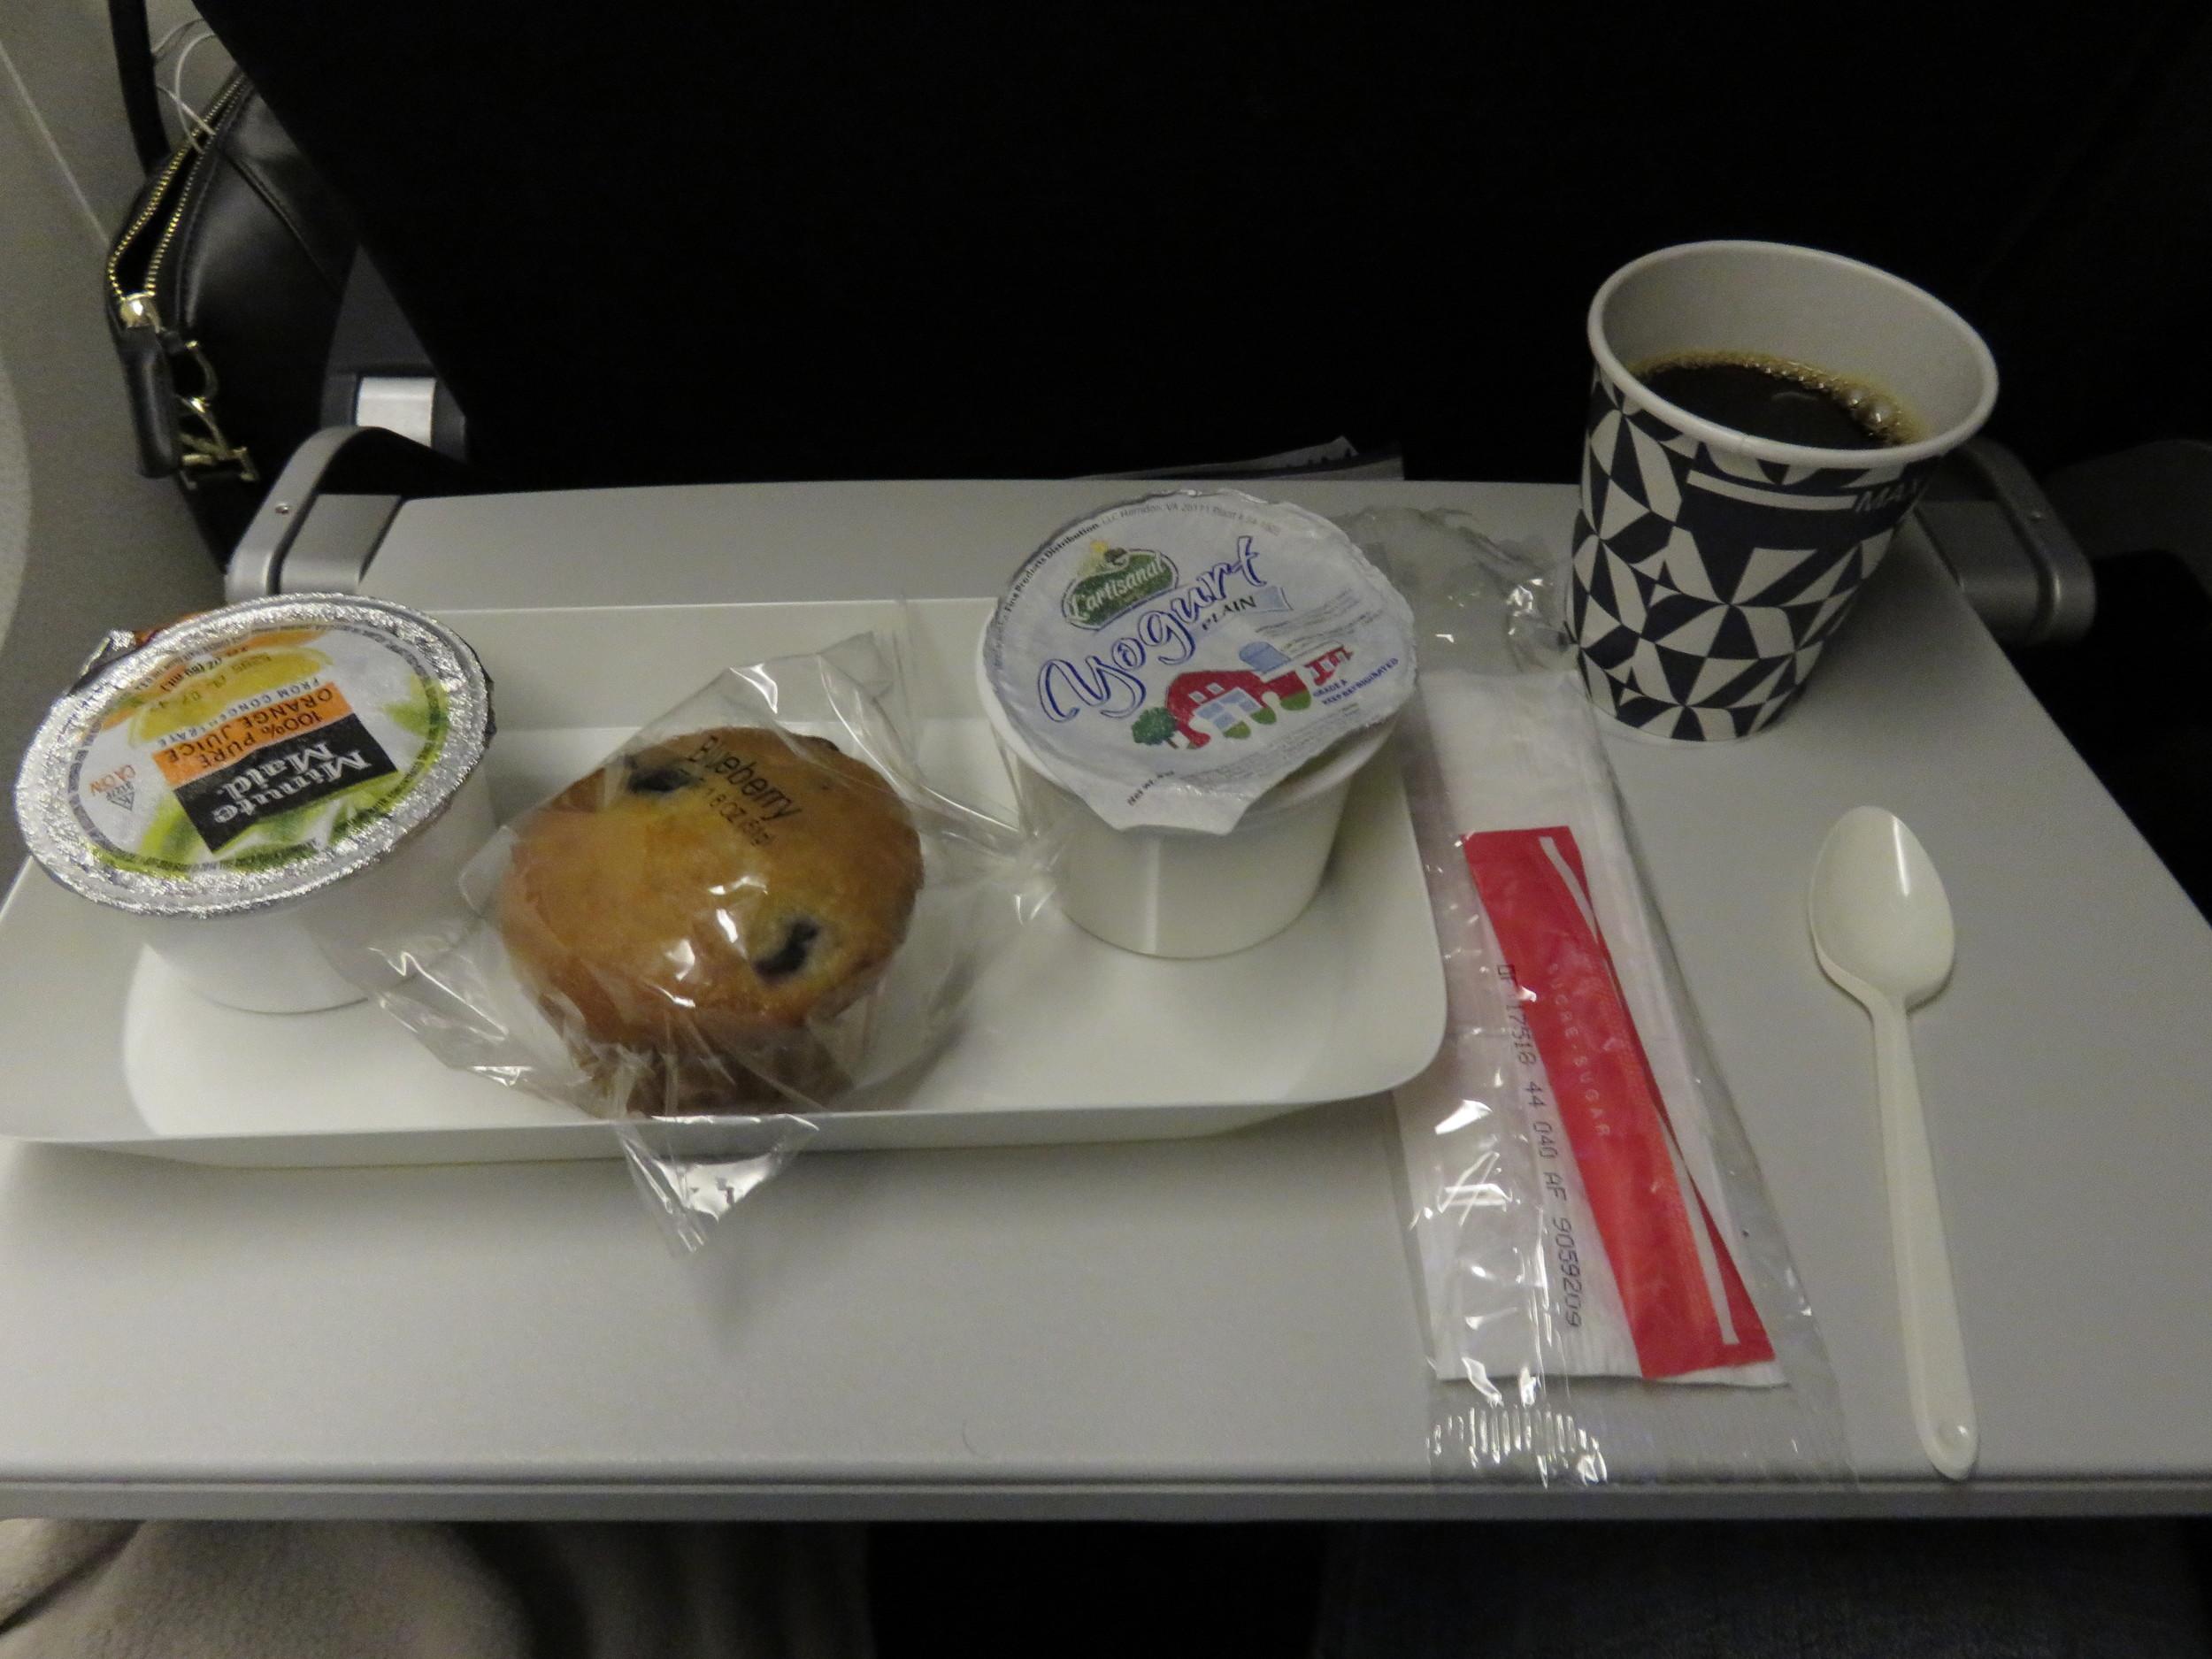 Air France pre-arrival breakfast